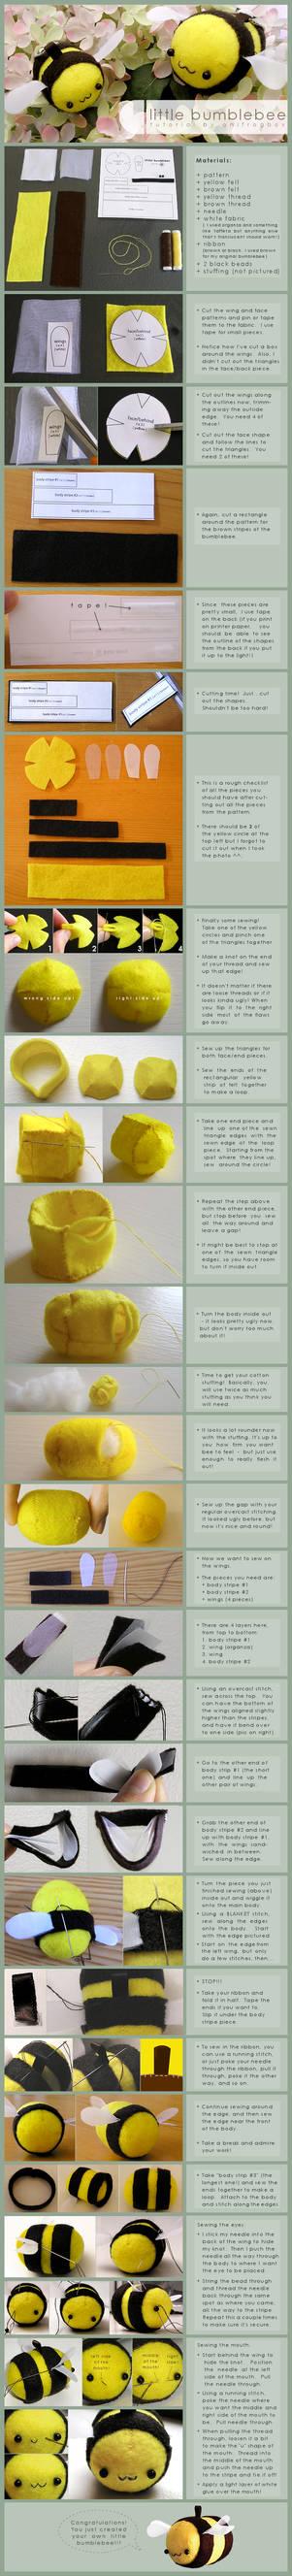 little bumblebee: tutorial by onifrogbox